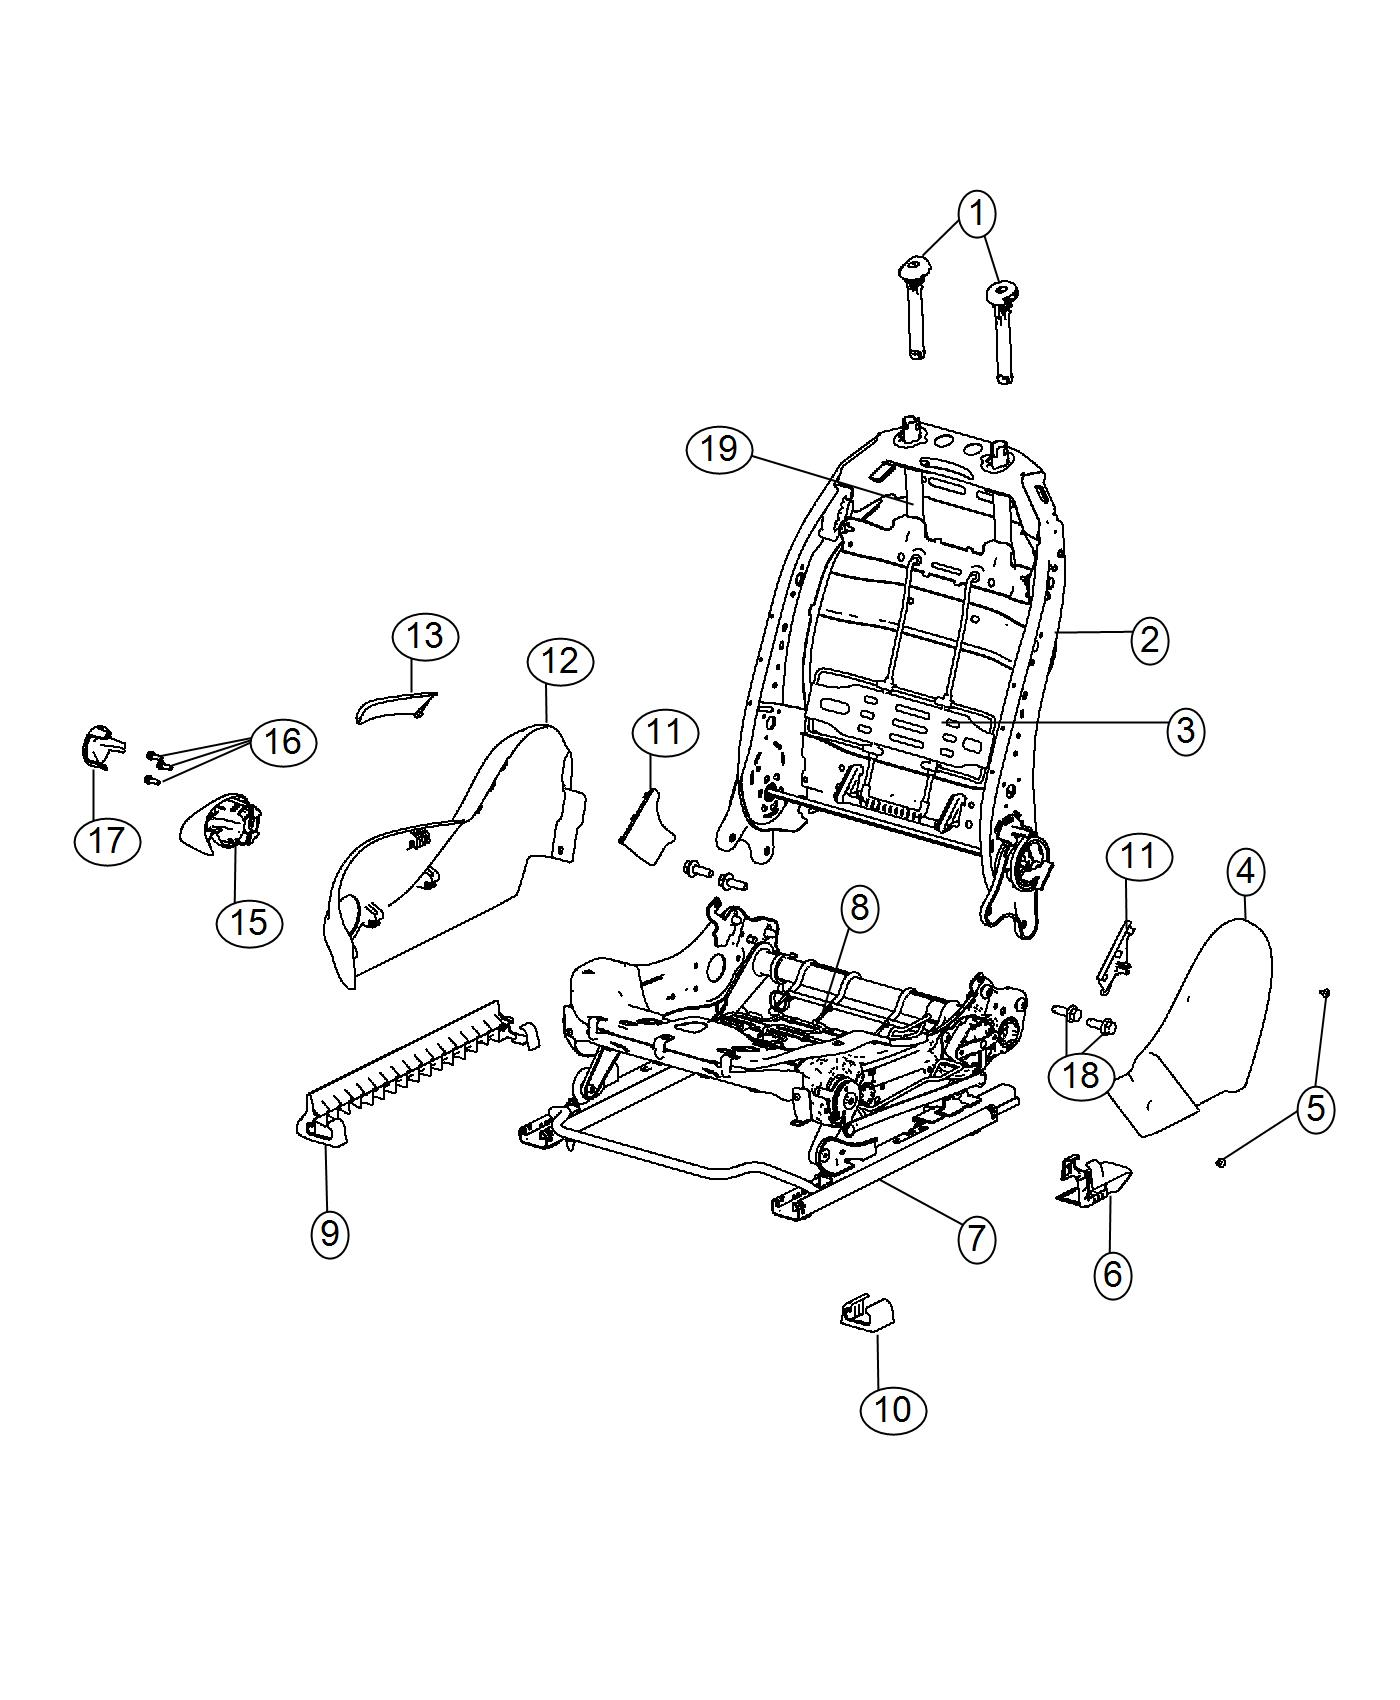 2016 Dodge Dart Shield. Passenger outboard. Trim: [cloth